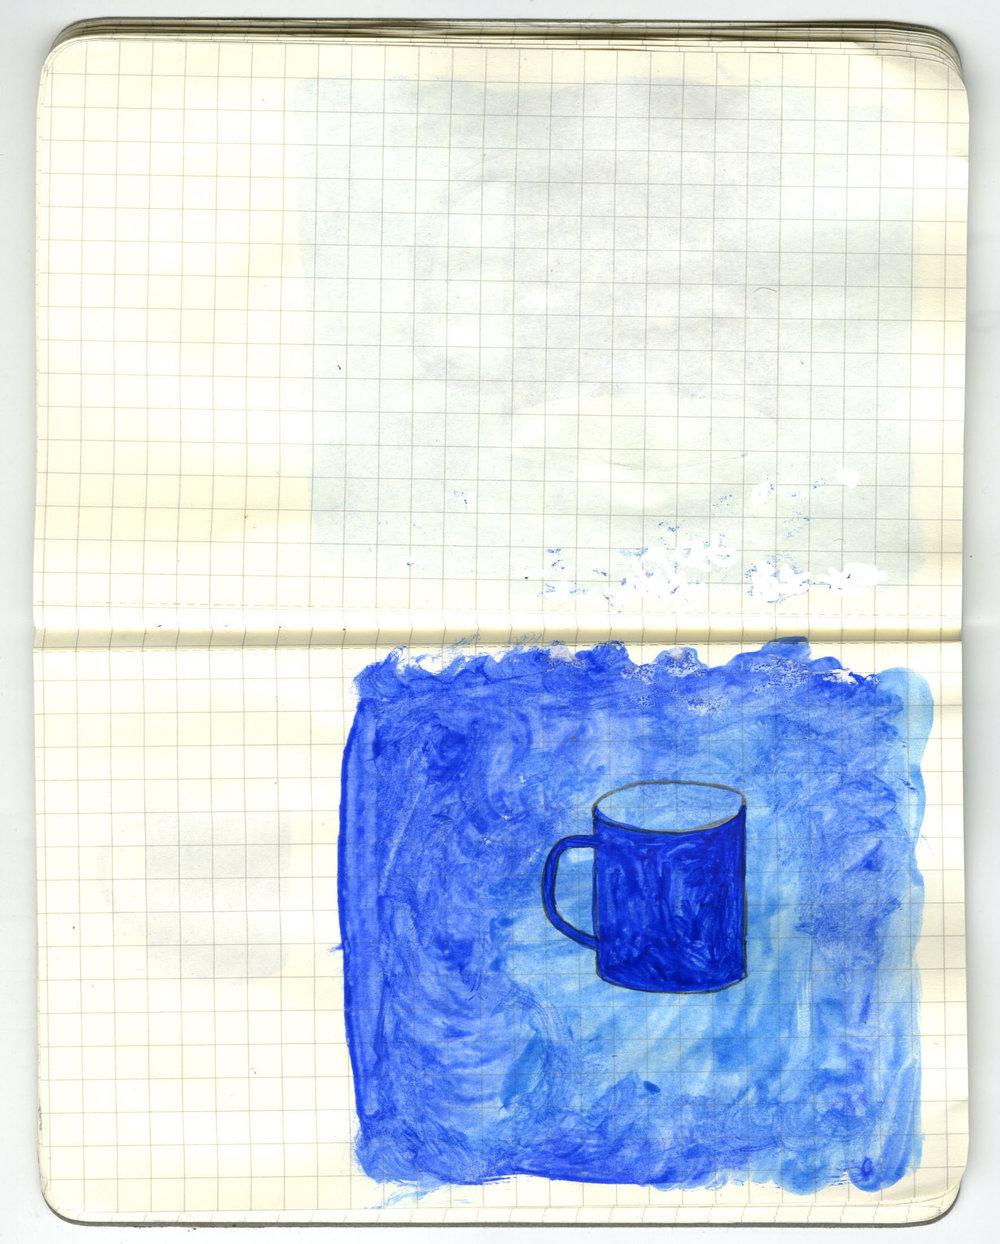 cup017.jpg